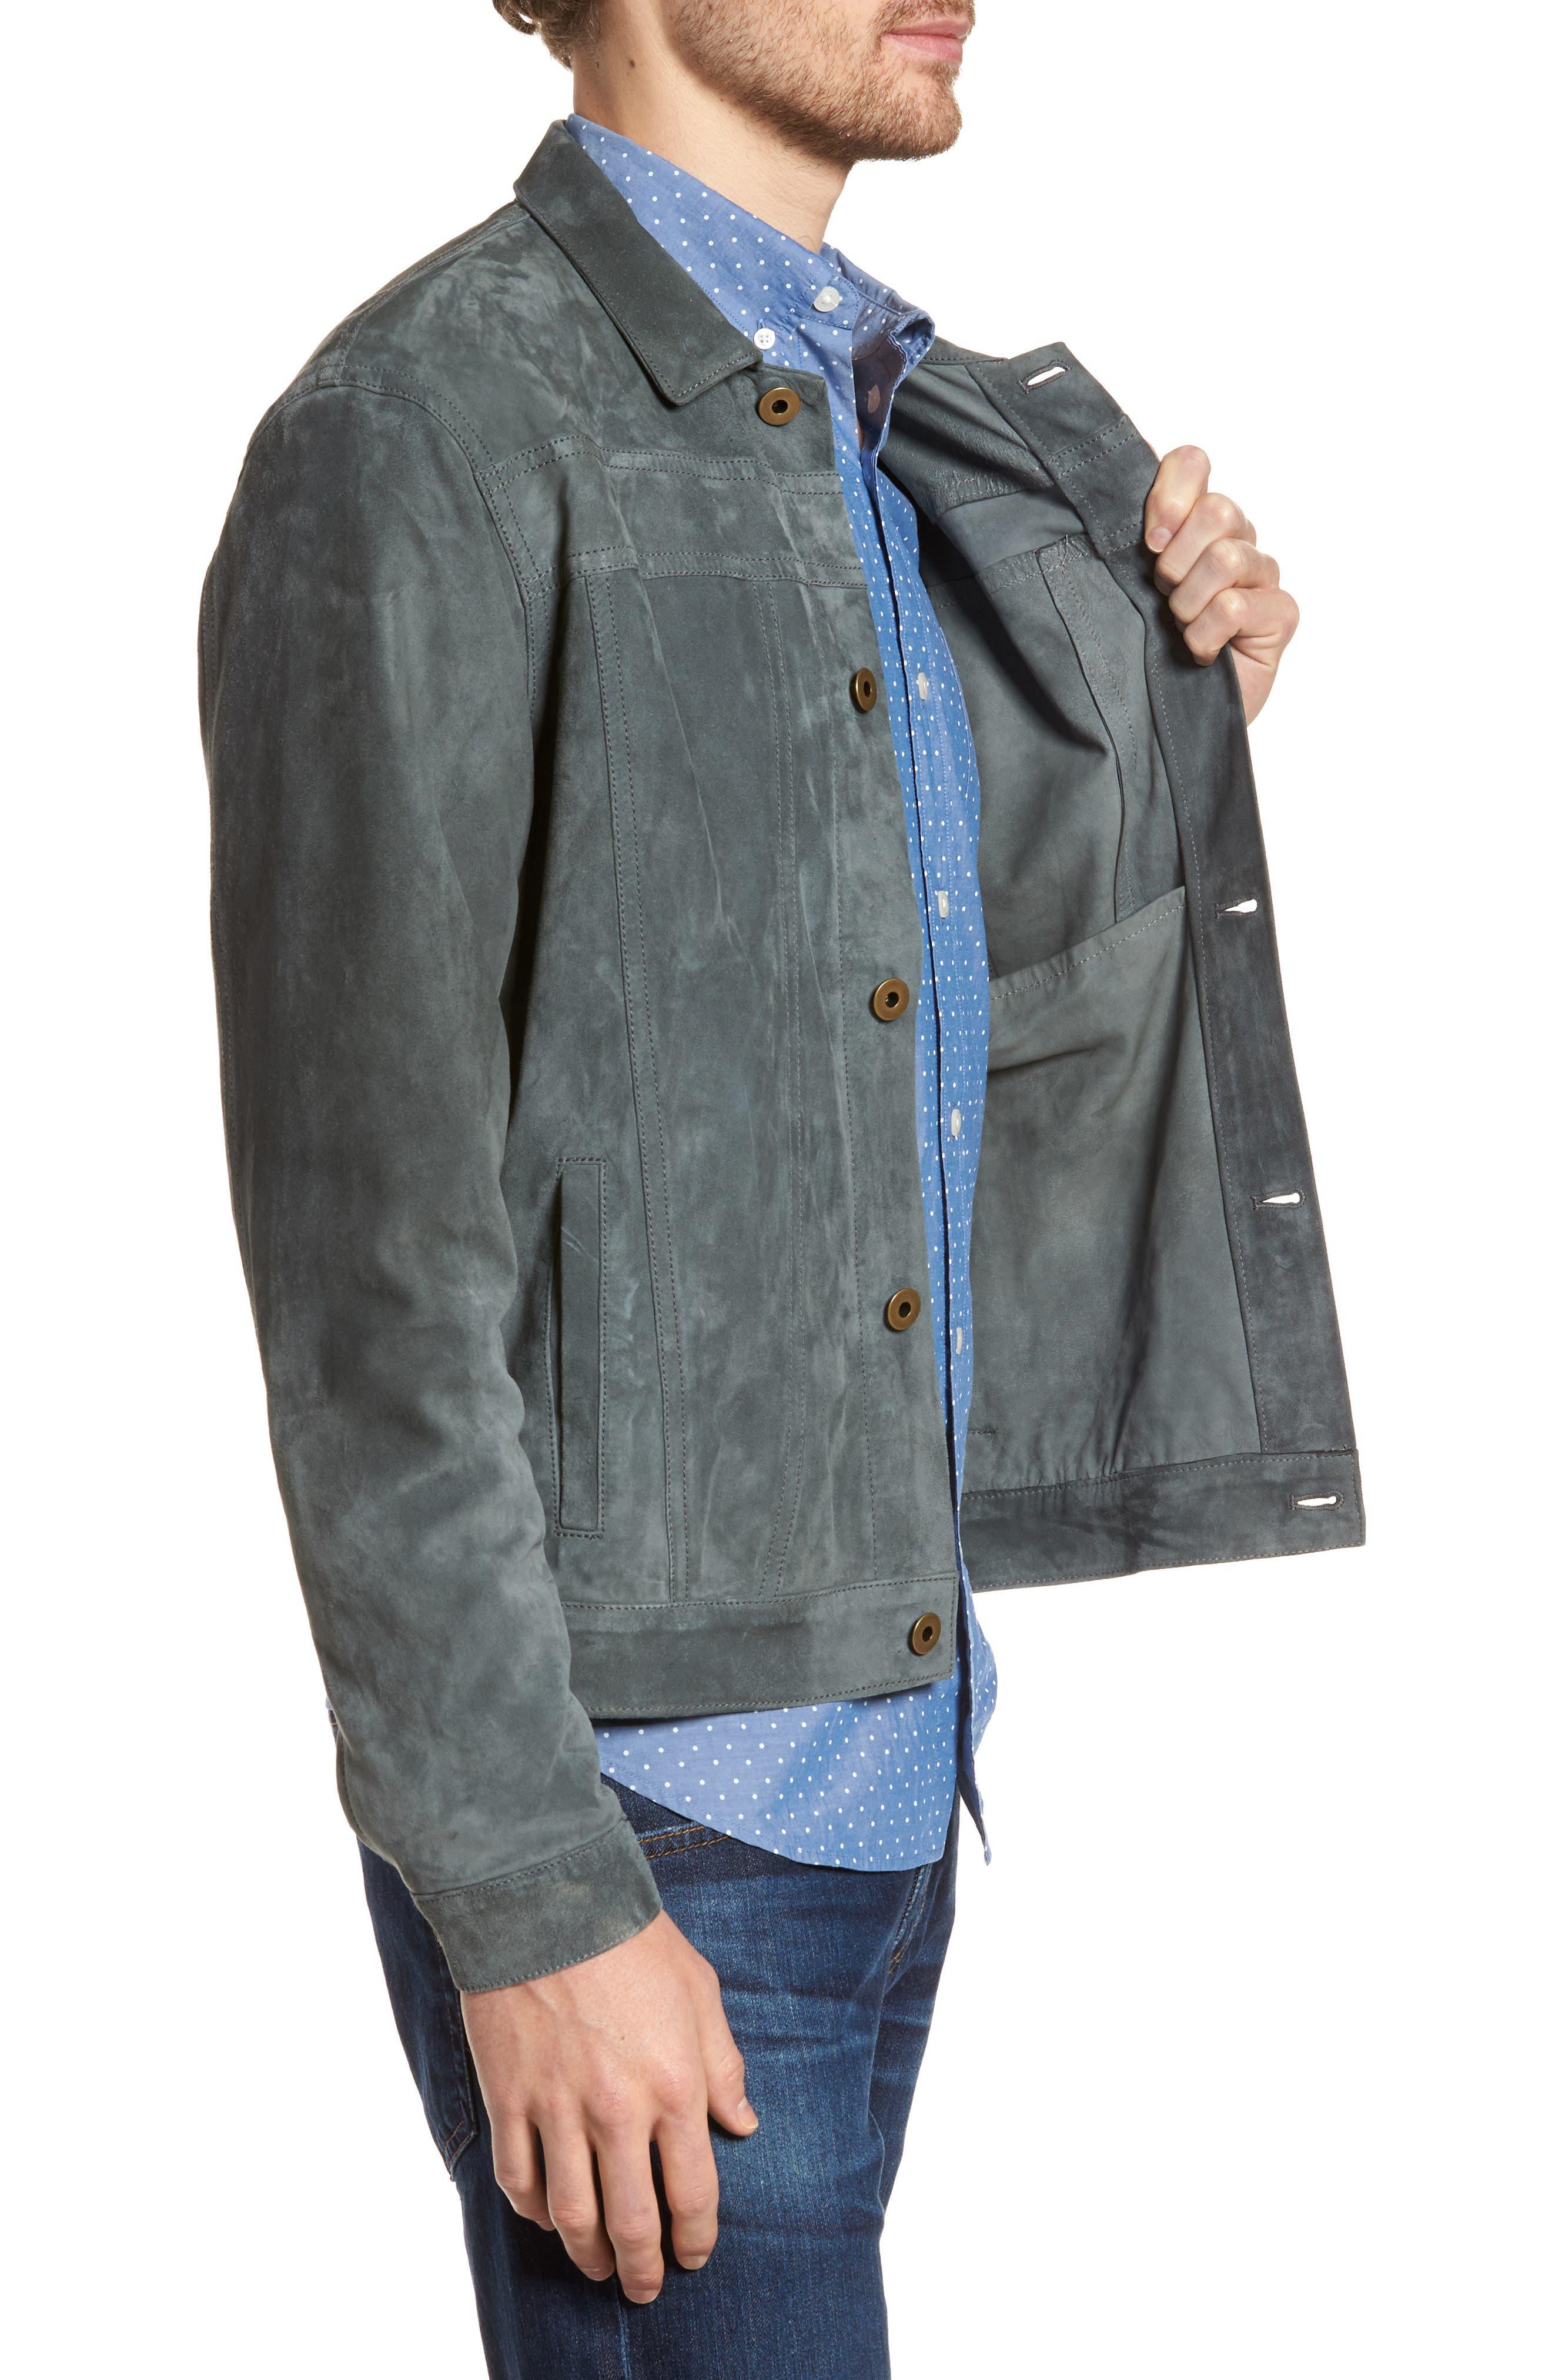 Cullen Suede Jacket,                             Alternate thumbnail 3, color,                             Aspha